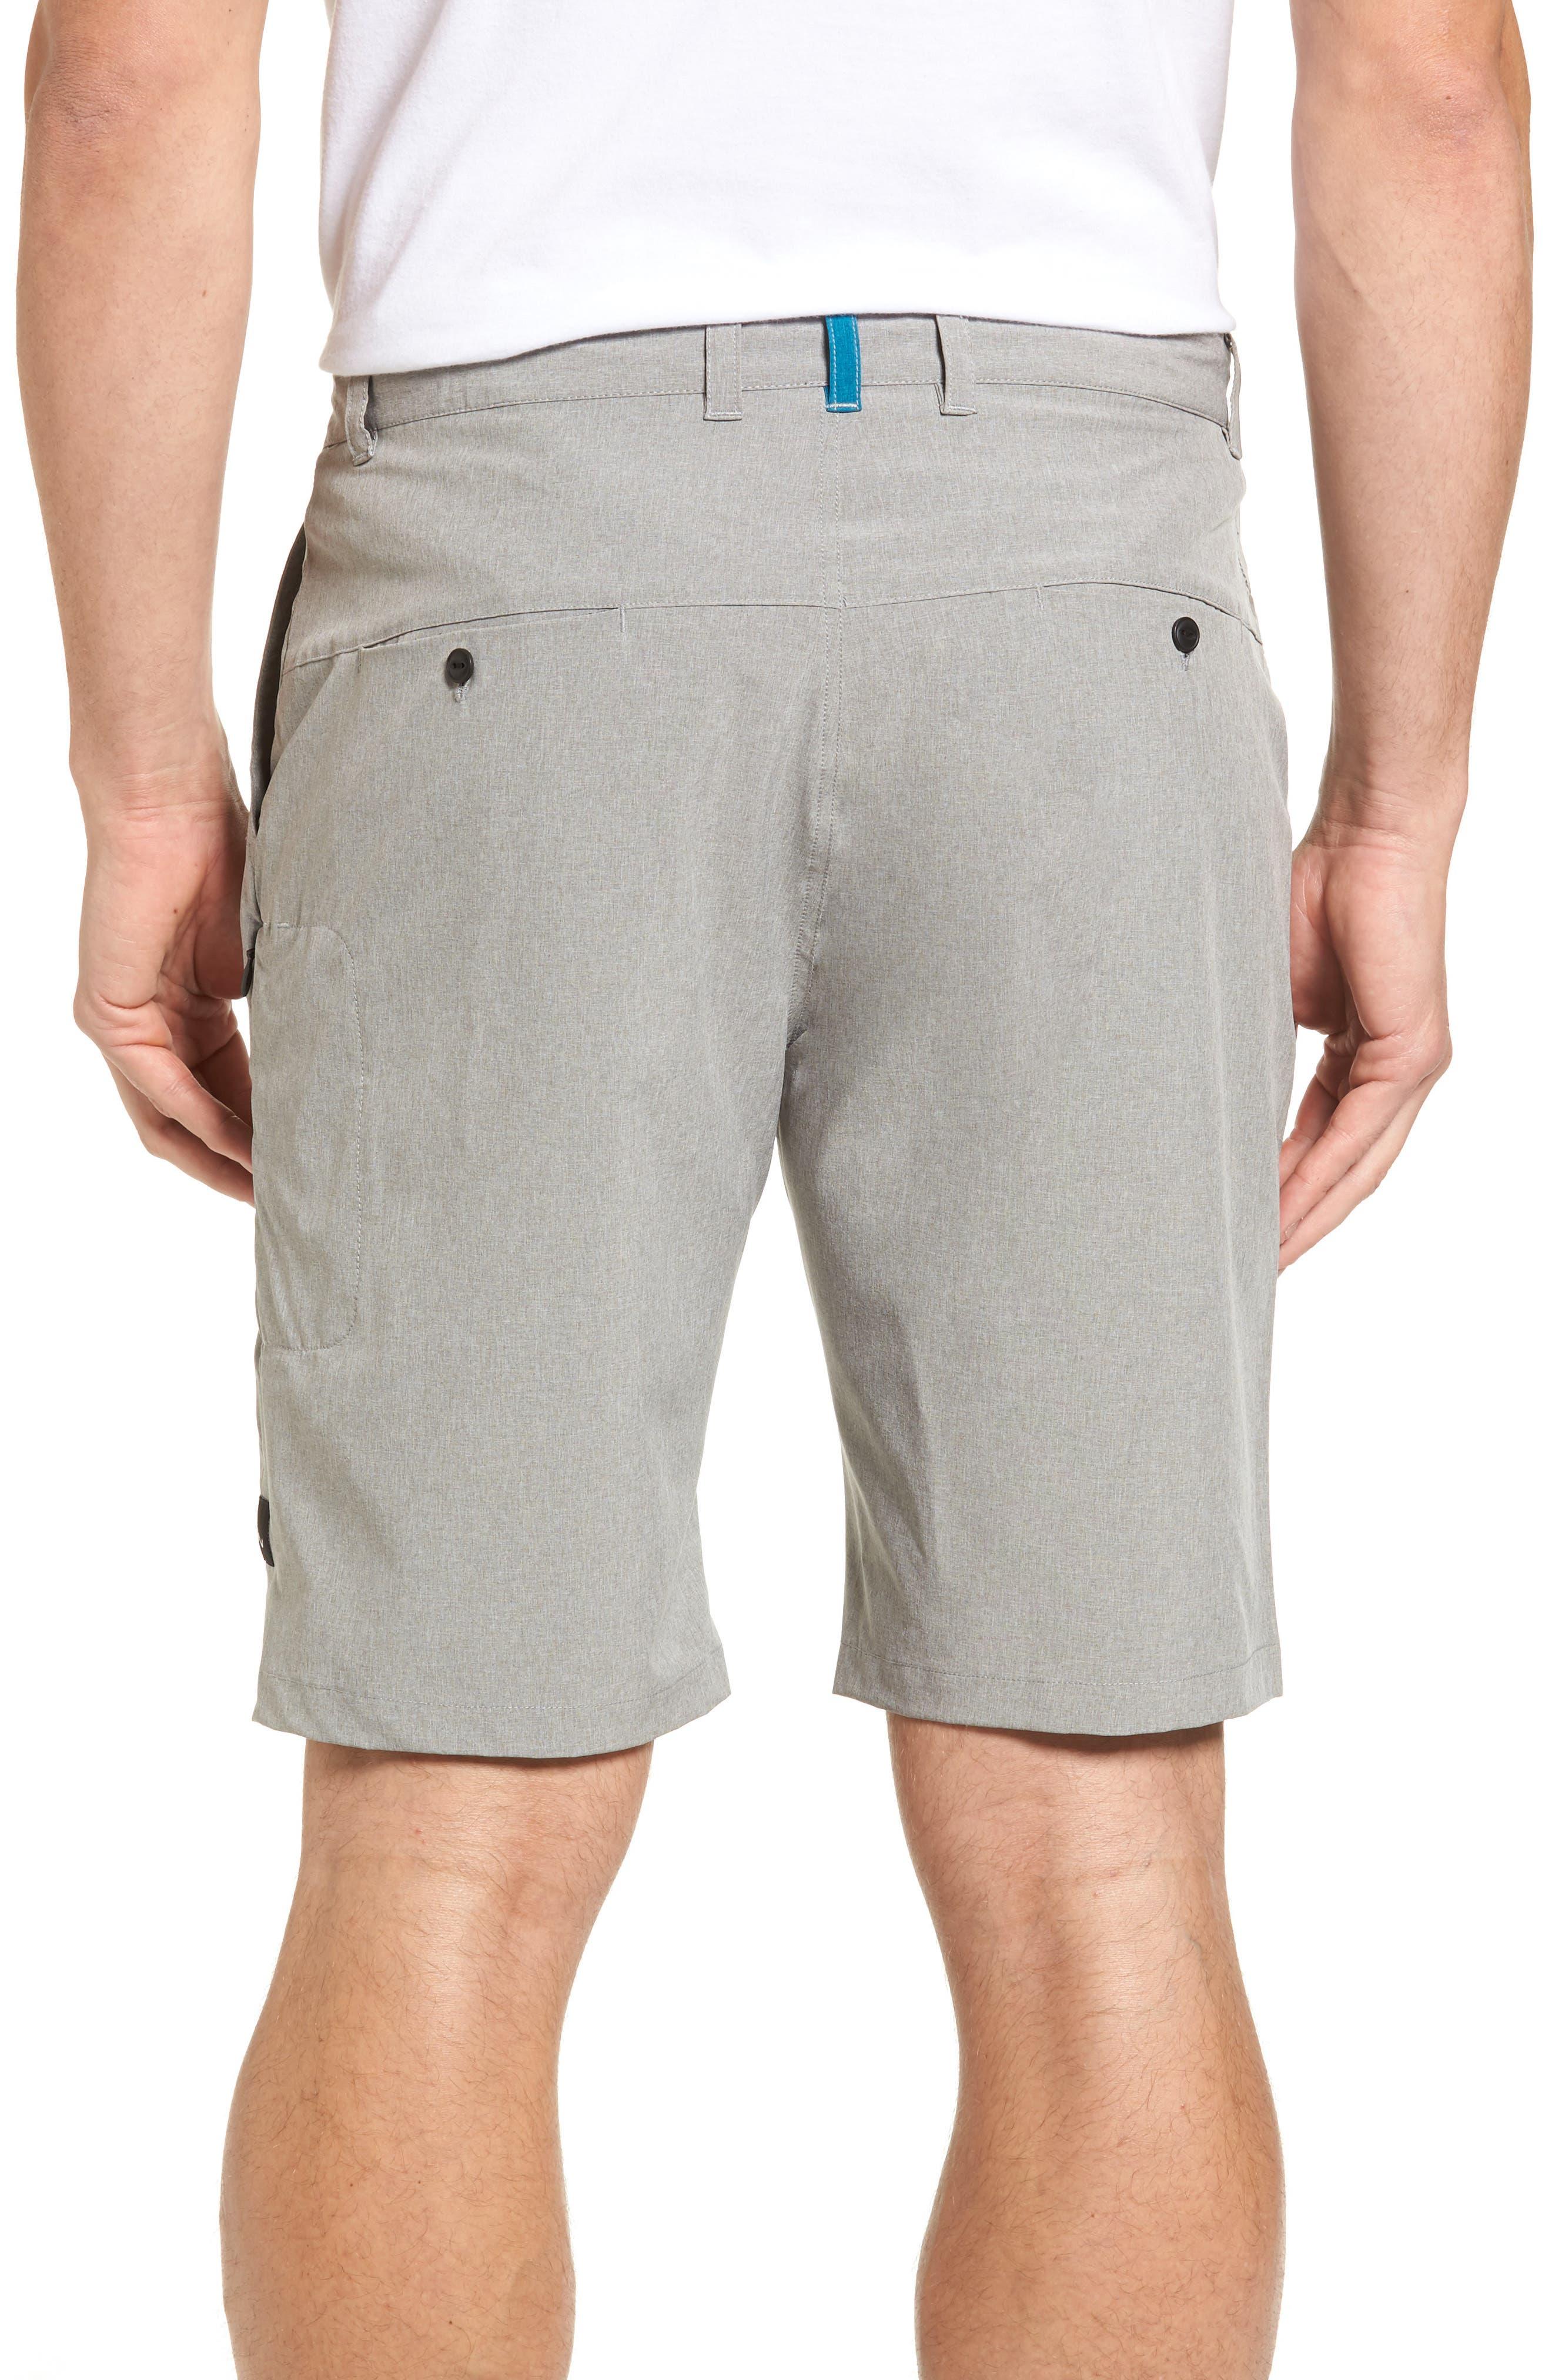 Freedom Carbon Cruiser Shorts,                             Alternate thumbnail 2, color,                             Grey